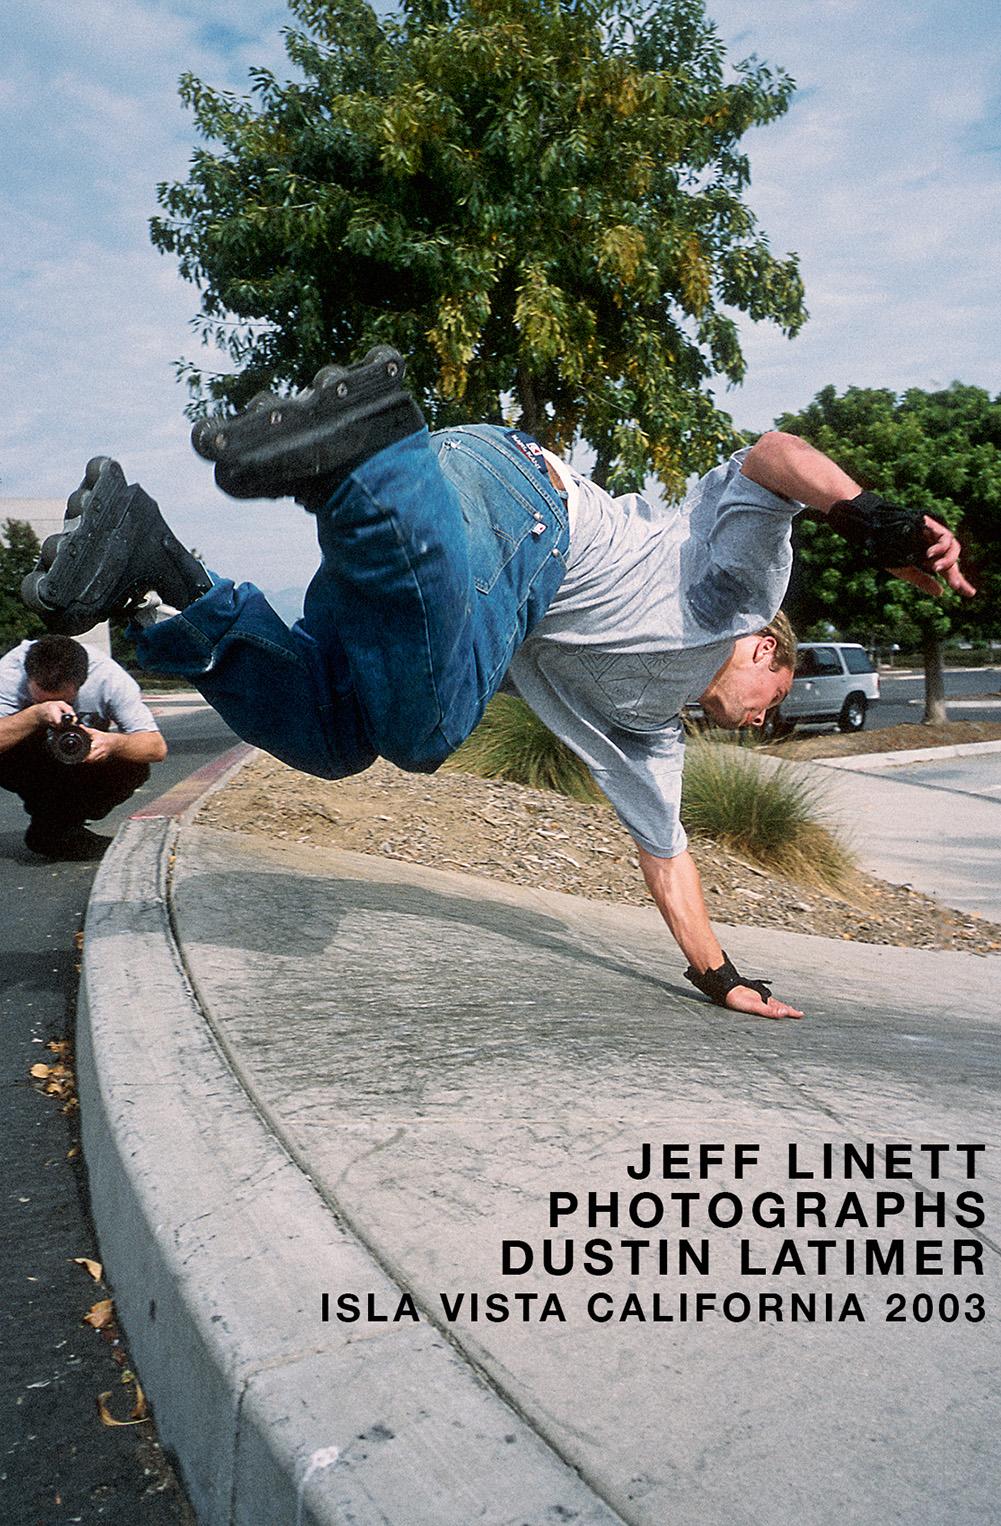 PHOTO VAULT #2: Dustin Latimer (Handslide)